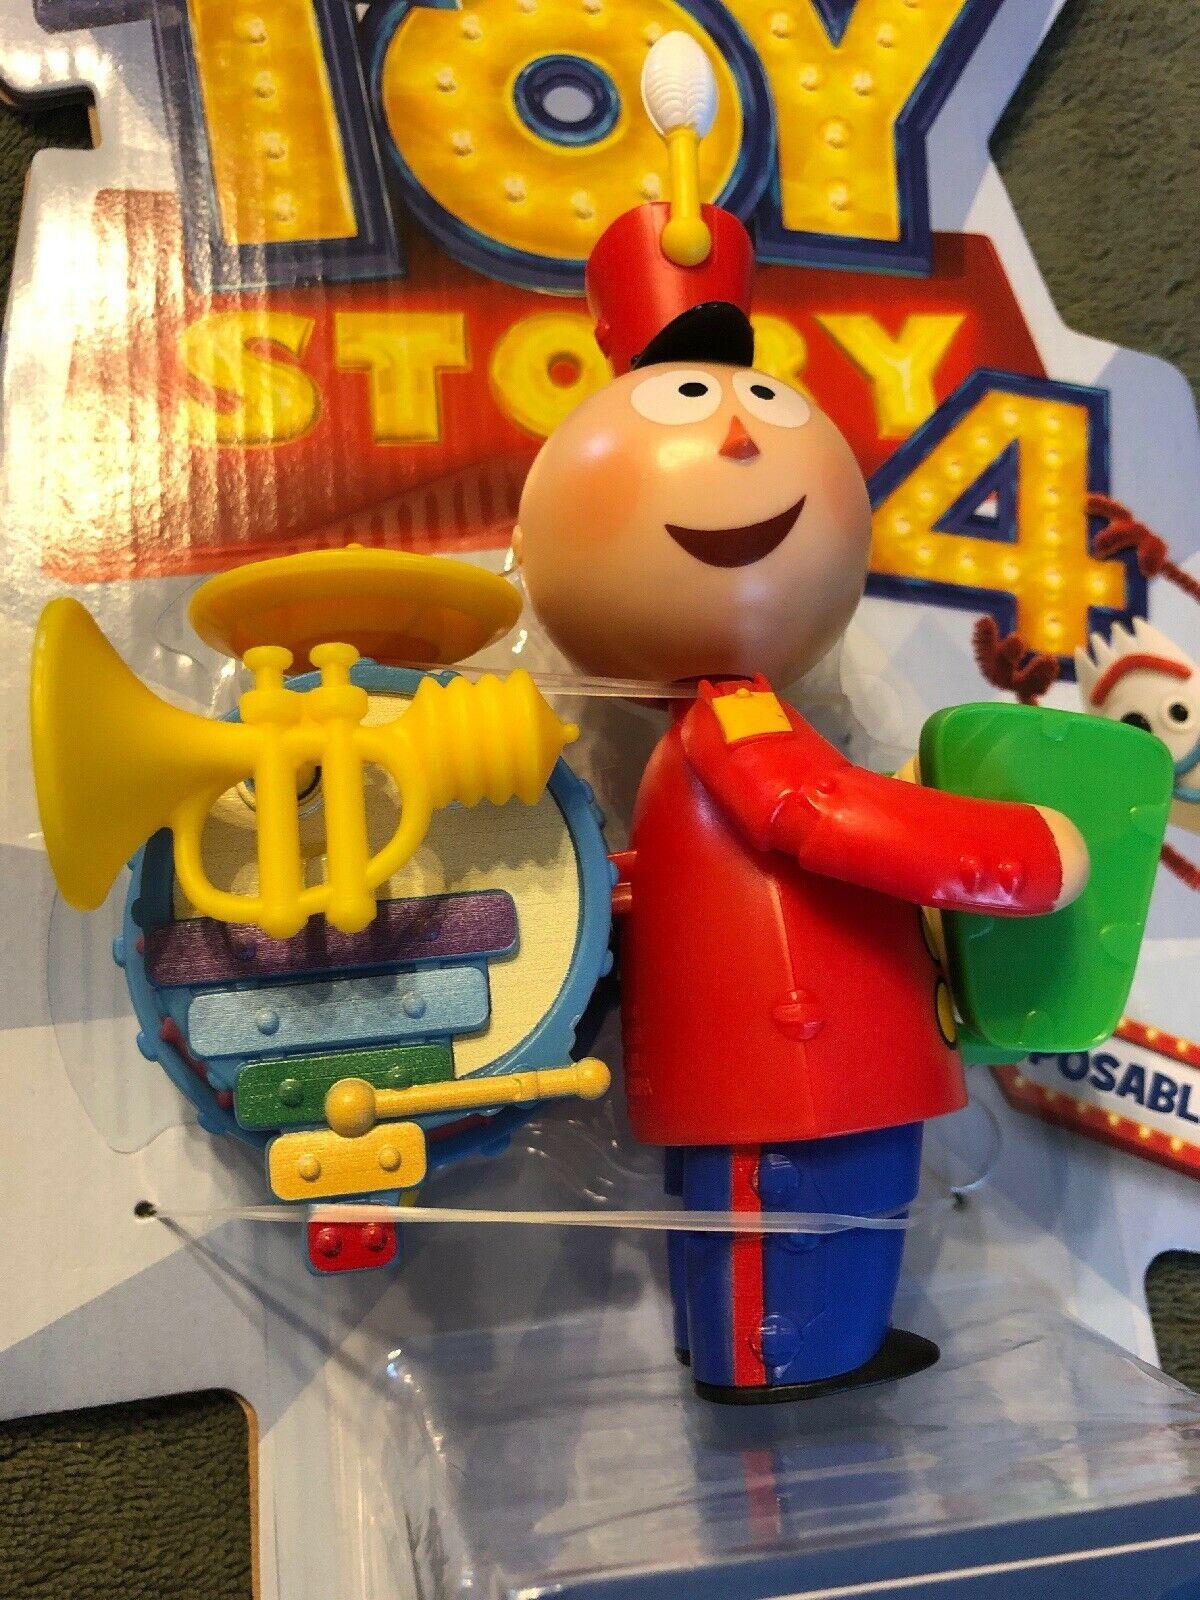 "Toy Story 4 Tinny Figure Disney Pixar 2019 Action Figure Poseable 6"" Inch image 2"